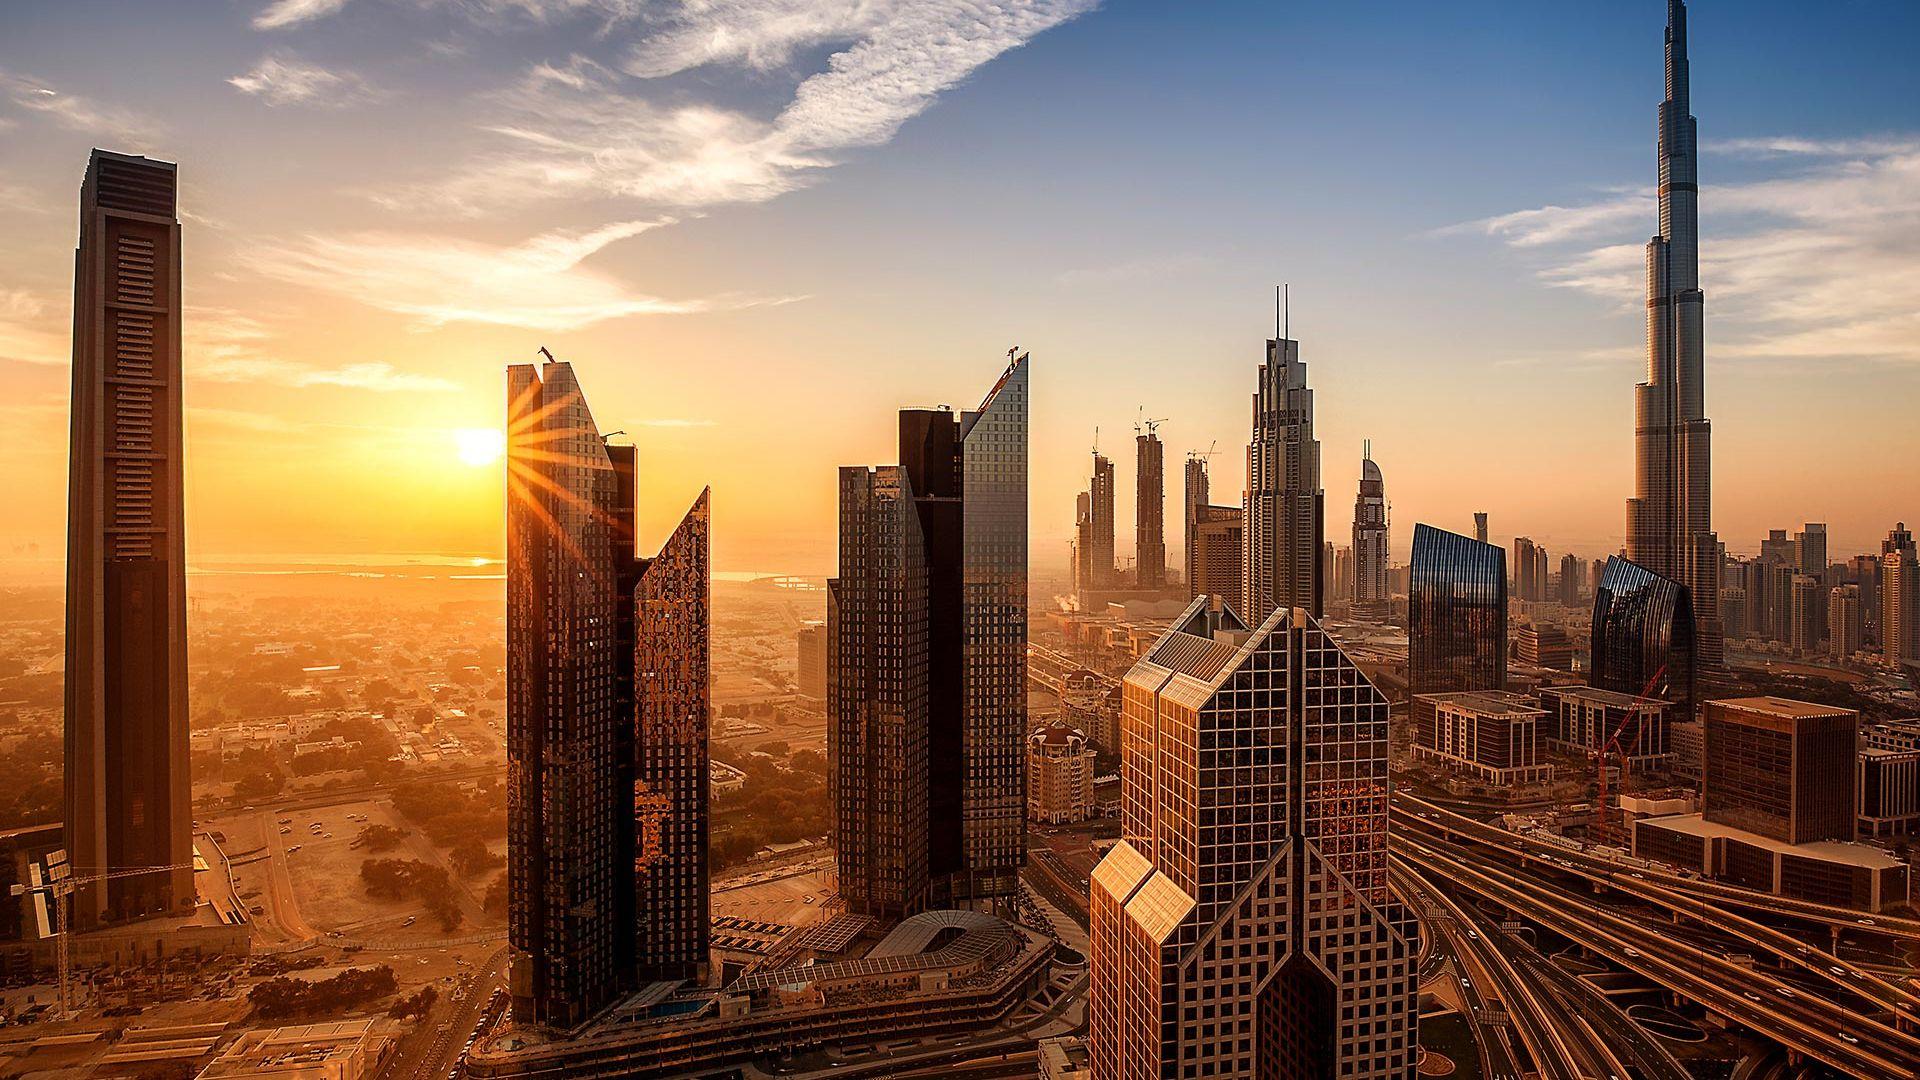 Oferta de weekend - Sejur charter Dubai, EAU, 8 zile - octombrie 2021